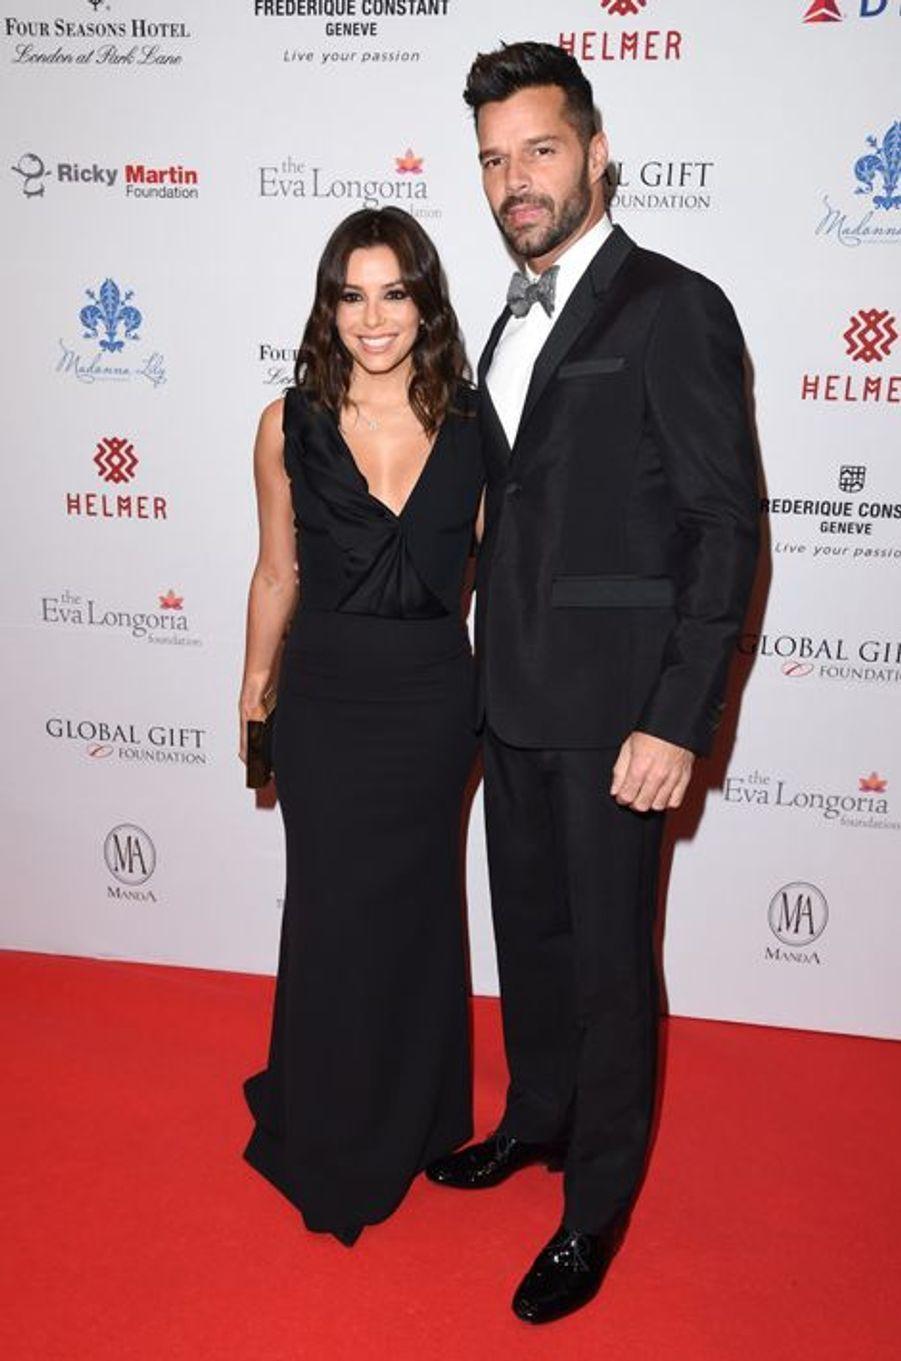 Eva Longoria et Ricky Martin à Londres le 17 novembre 2014